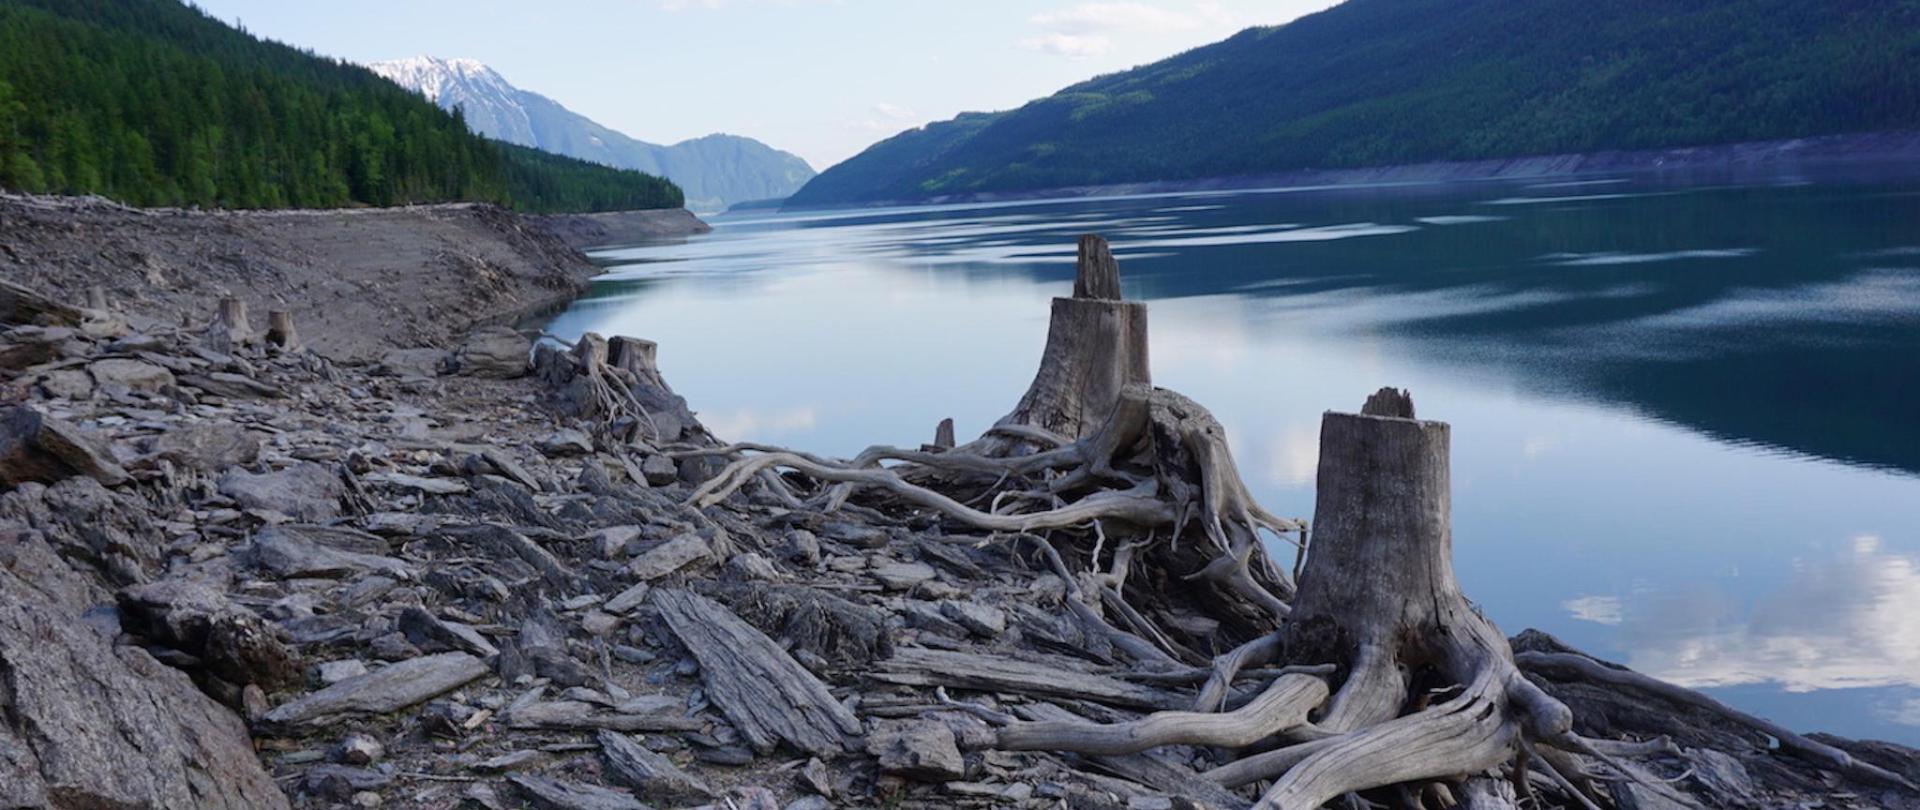 duncan lake 2 1920x1350.JPG